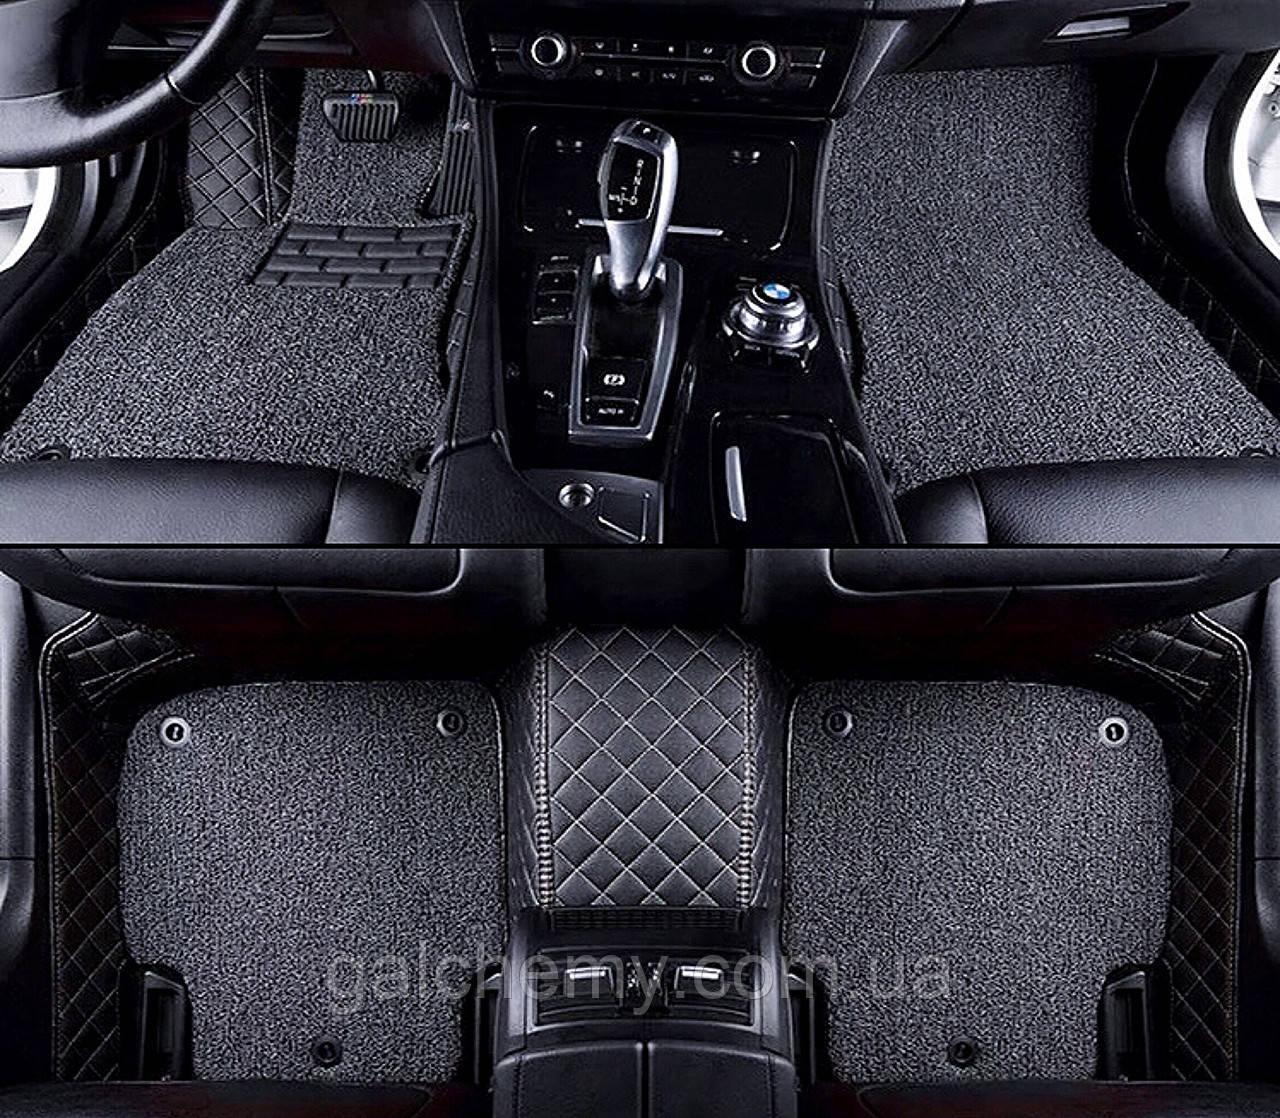 Коврики Комплект Ворс Пвх Toyota Land Cruiser 200 7 мест 2016-